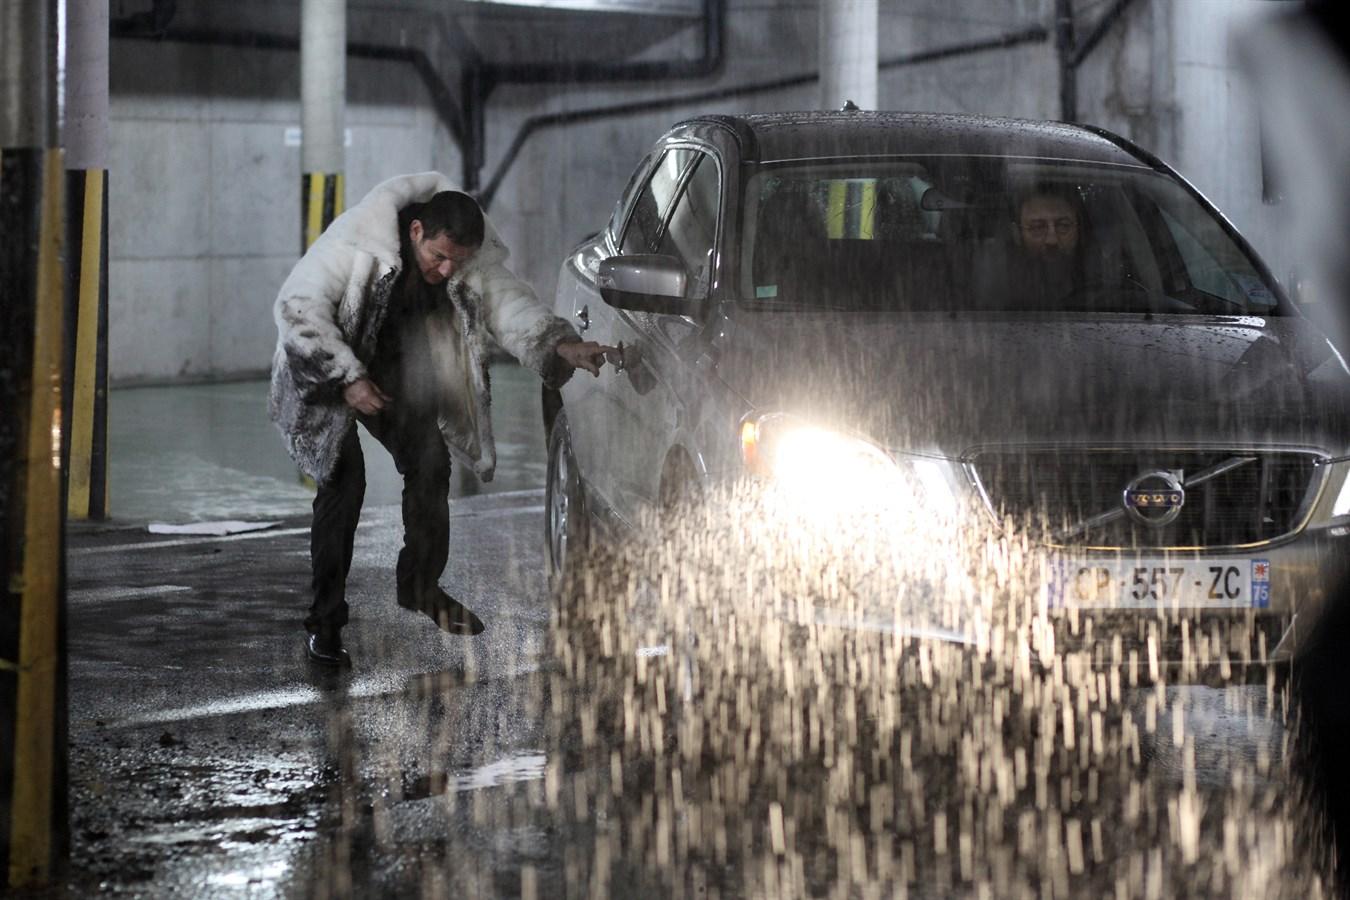 SUPERCONDRIAQUE MET LE VOLVO XC60 A L'ECRAN  - (c) Jean-Claude Lother.jpg